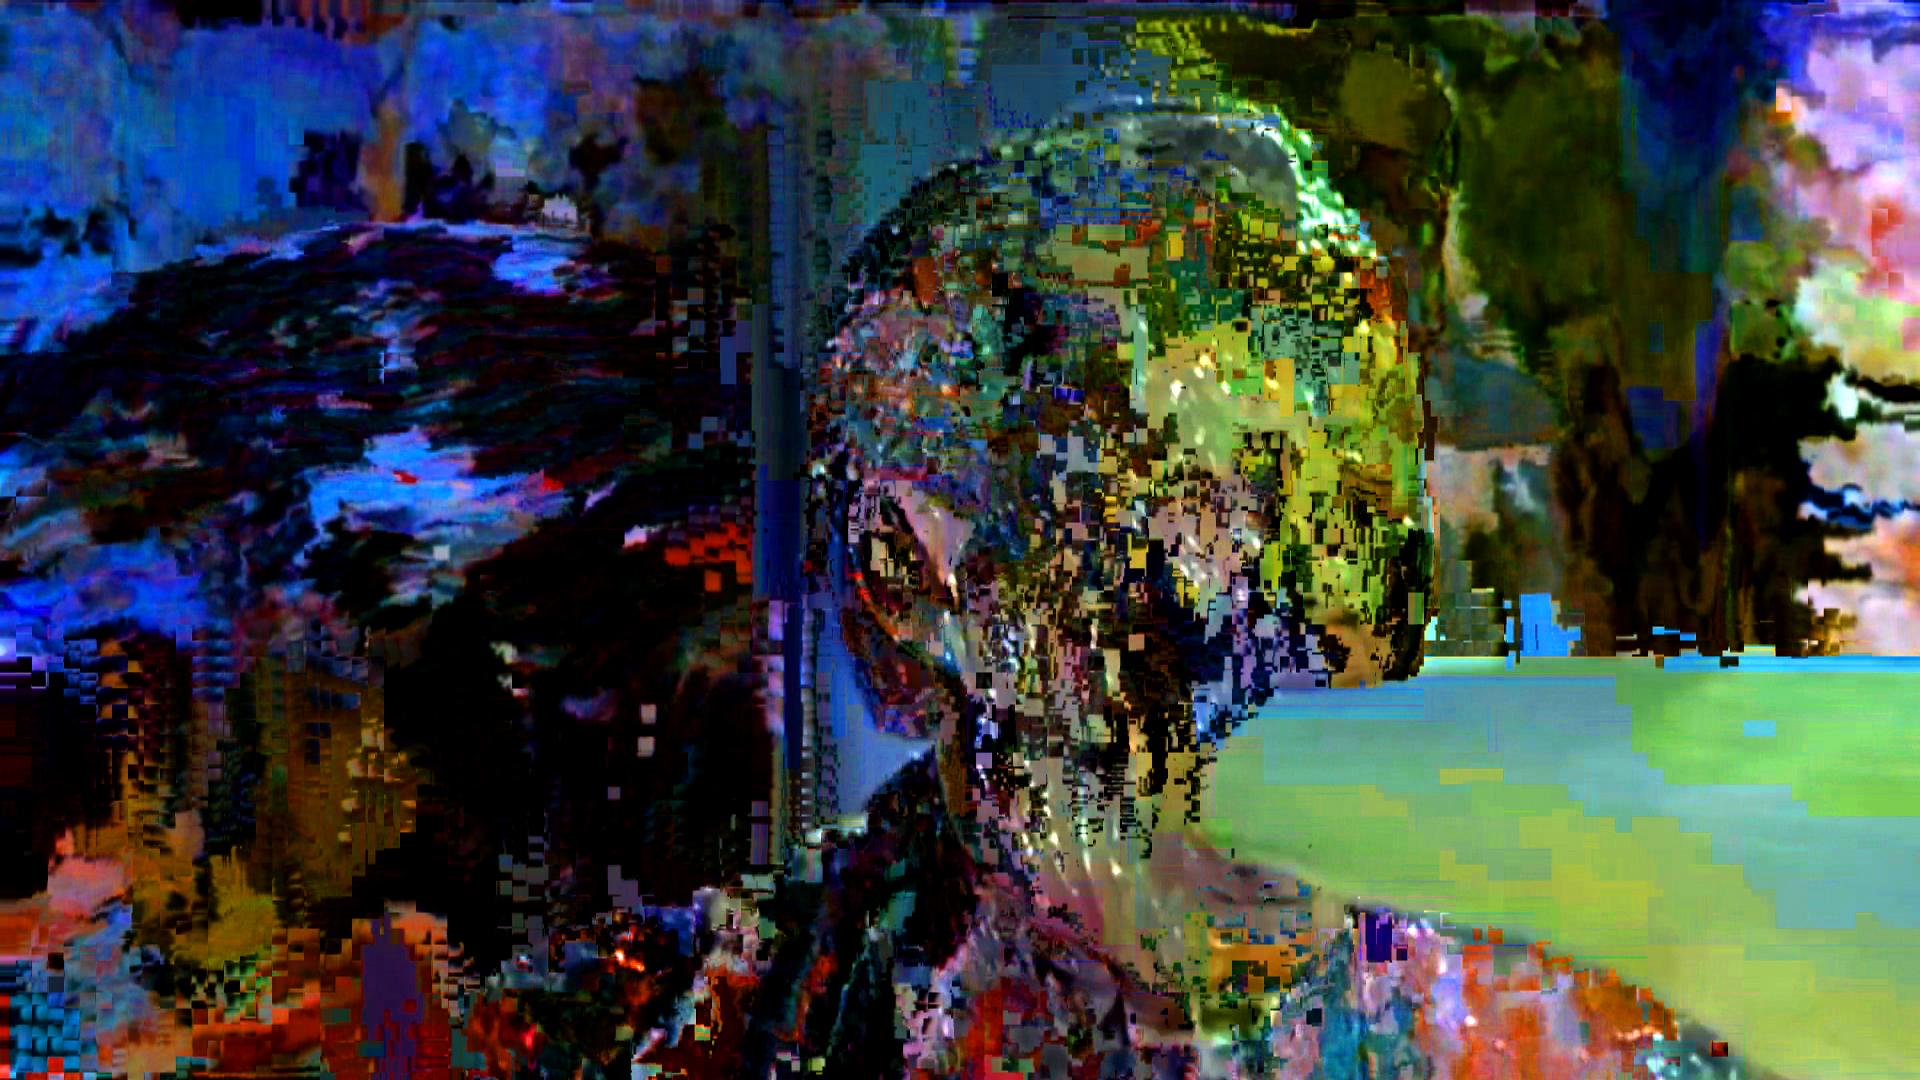 Technicolour_yawn.jpg